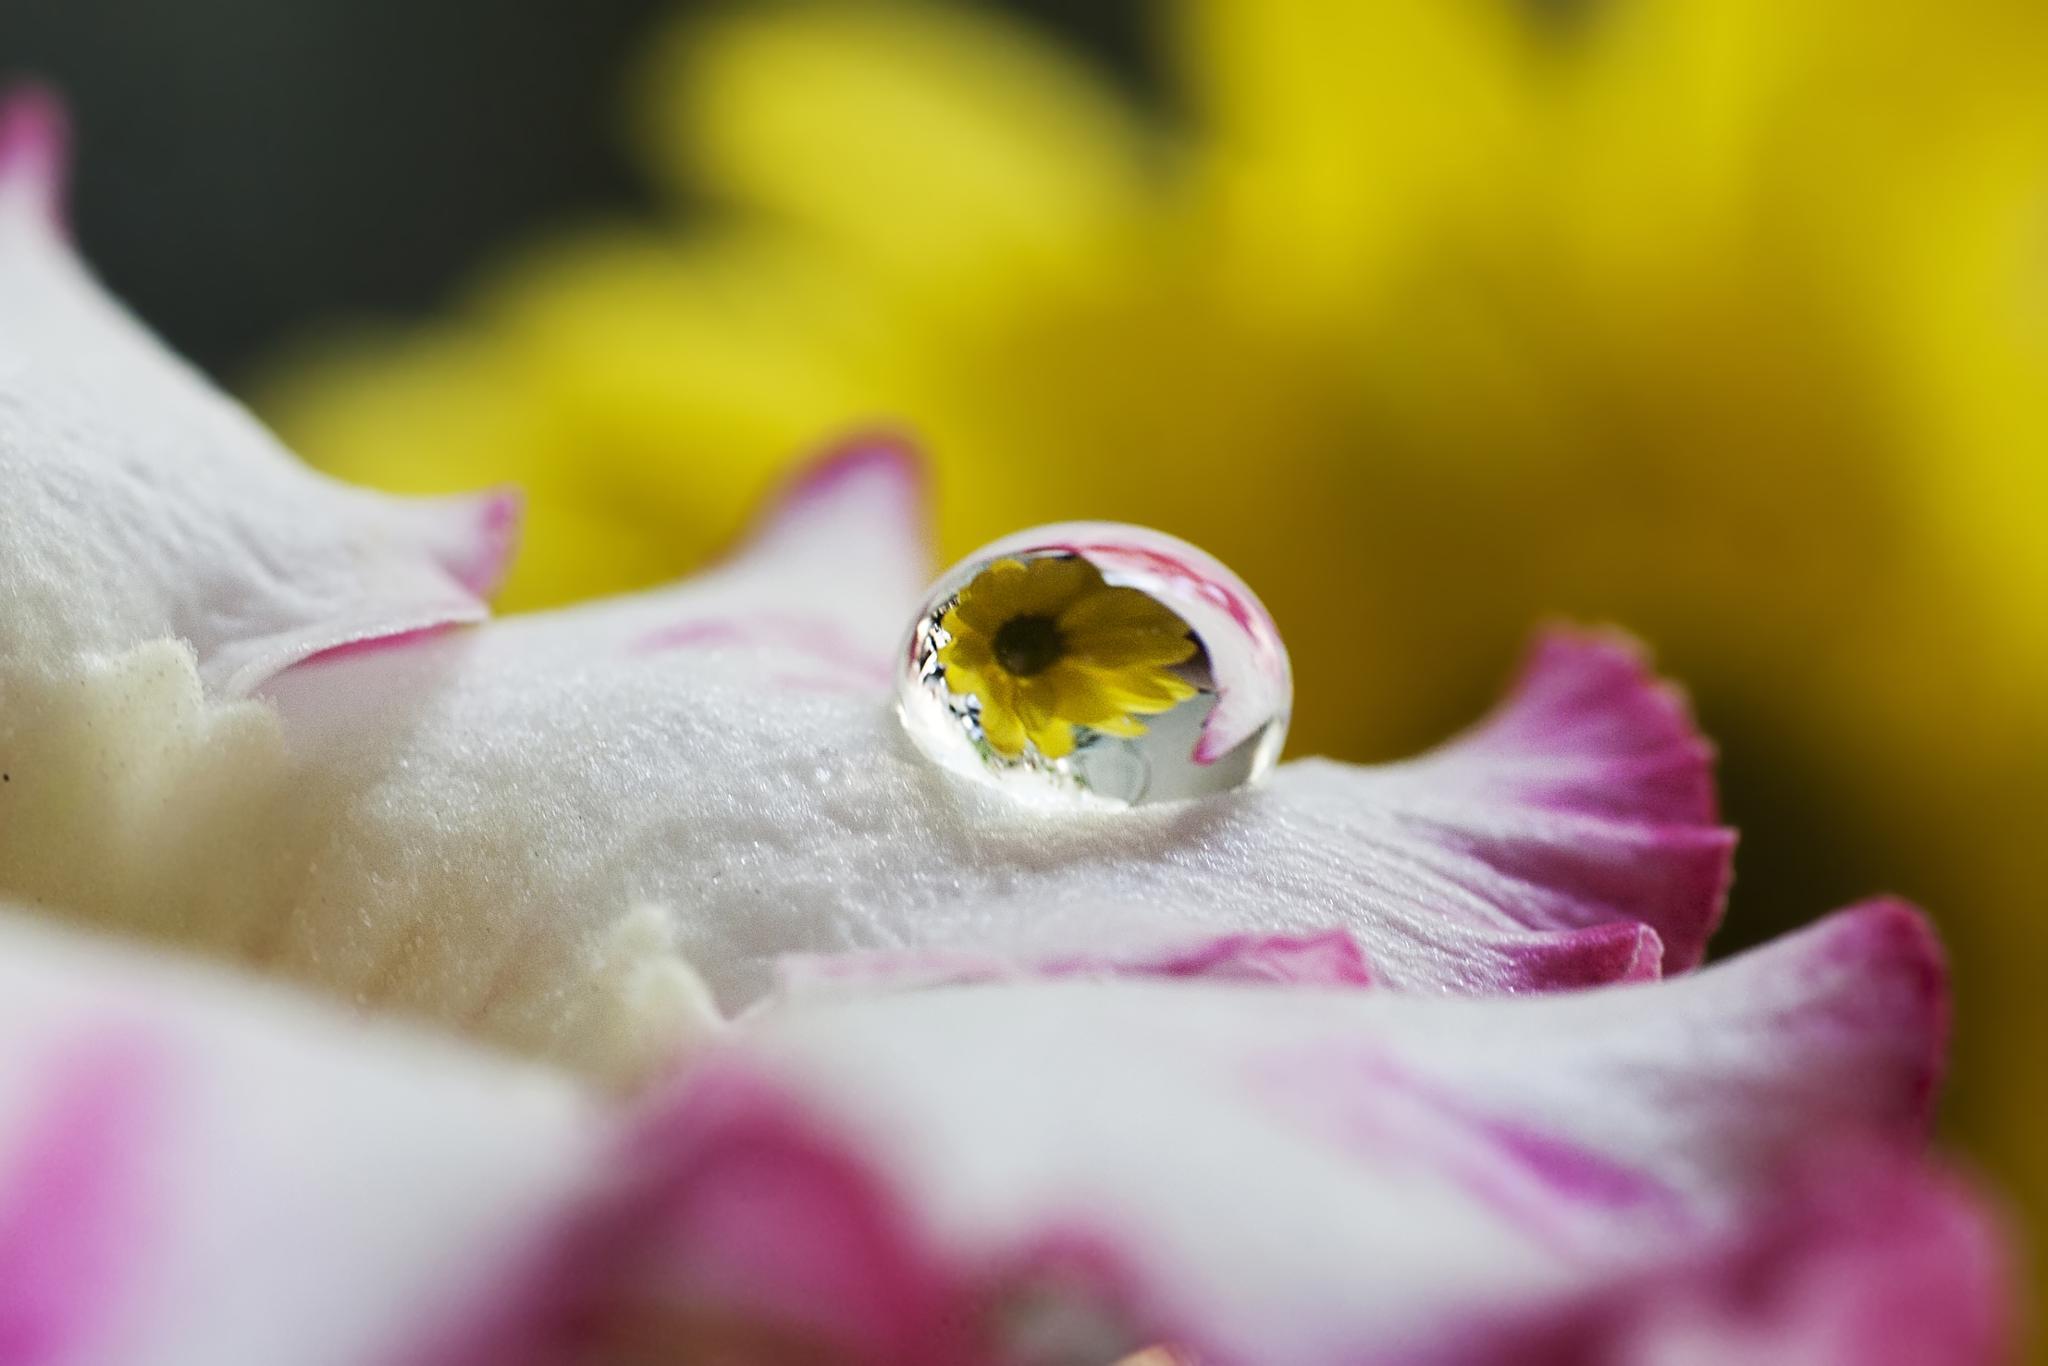 reflection by halimqomarudin